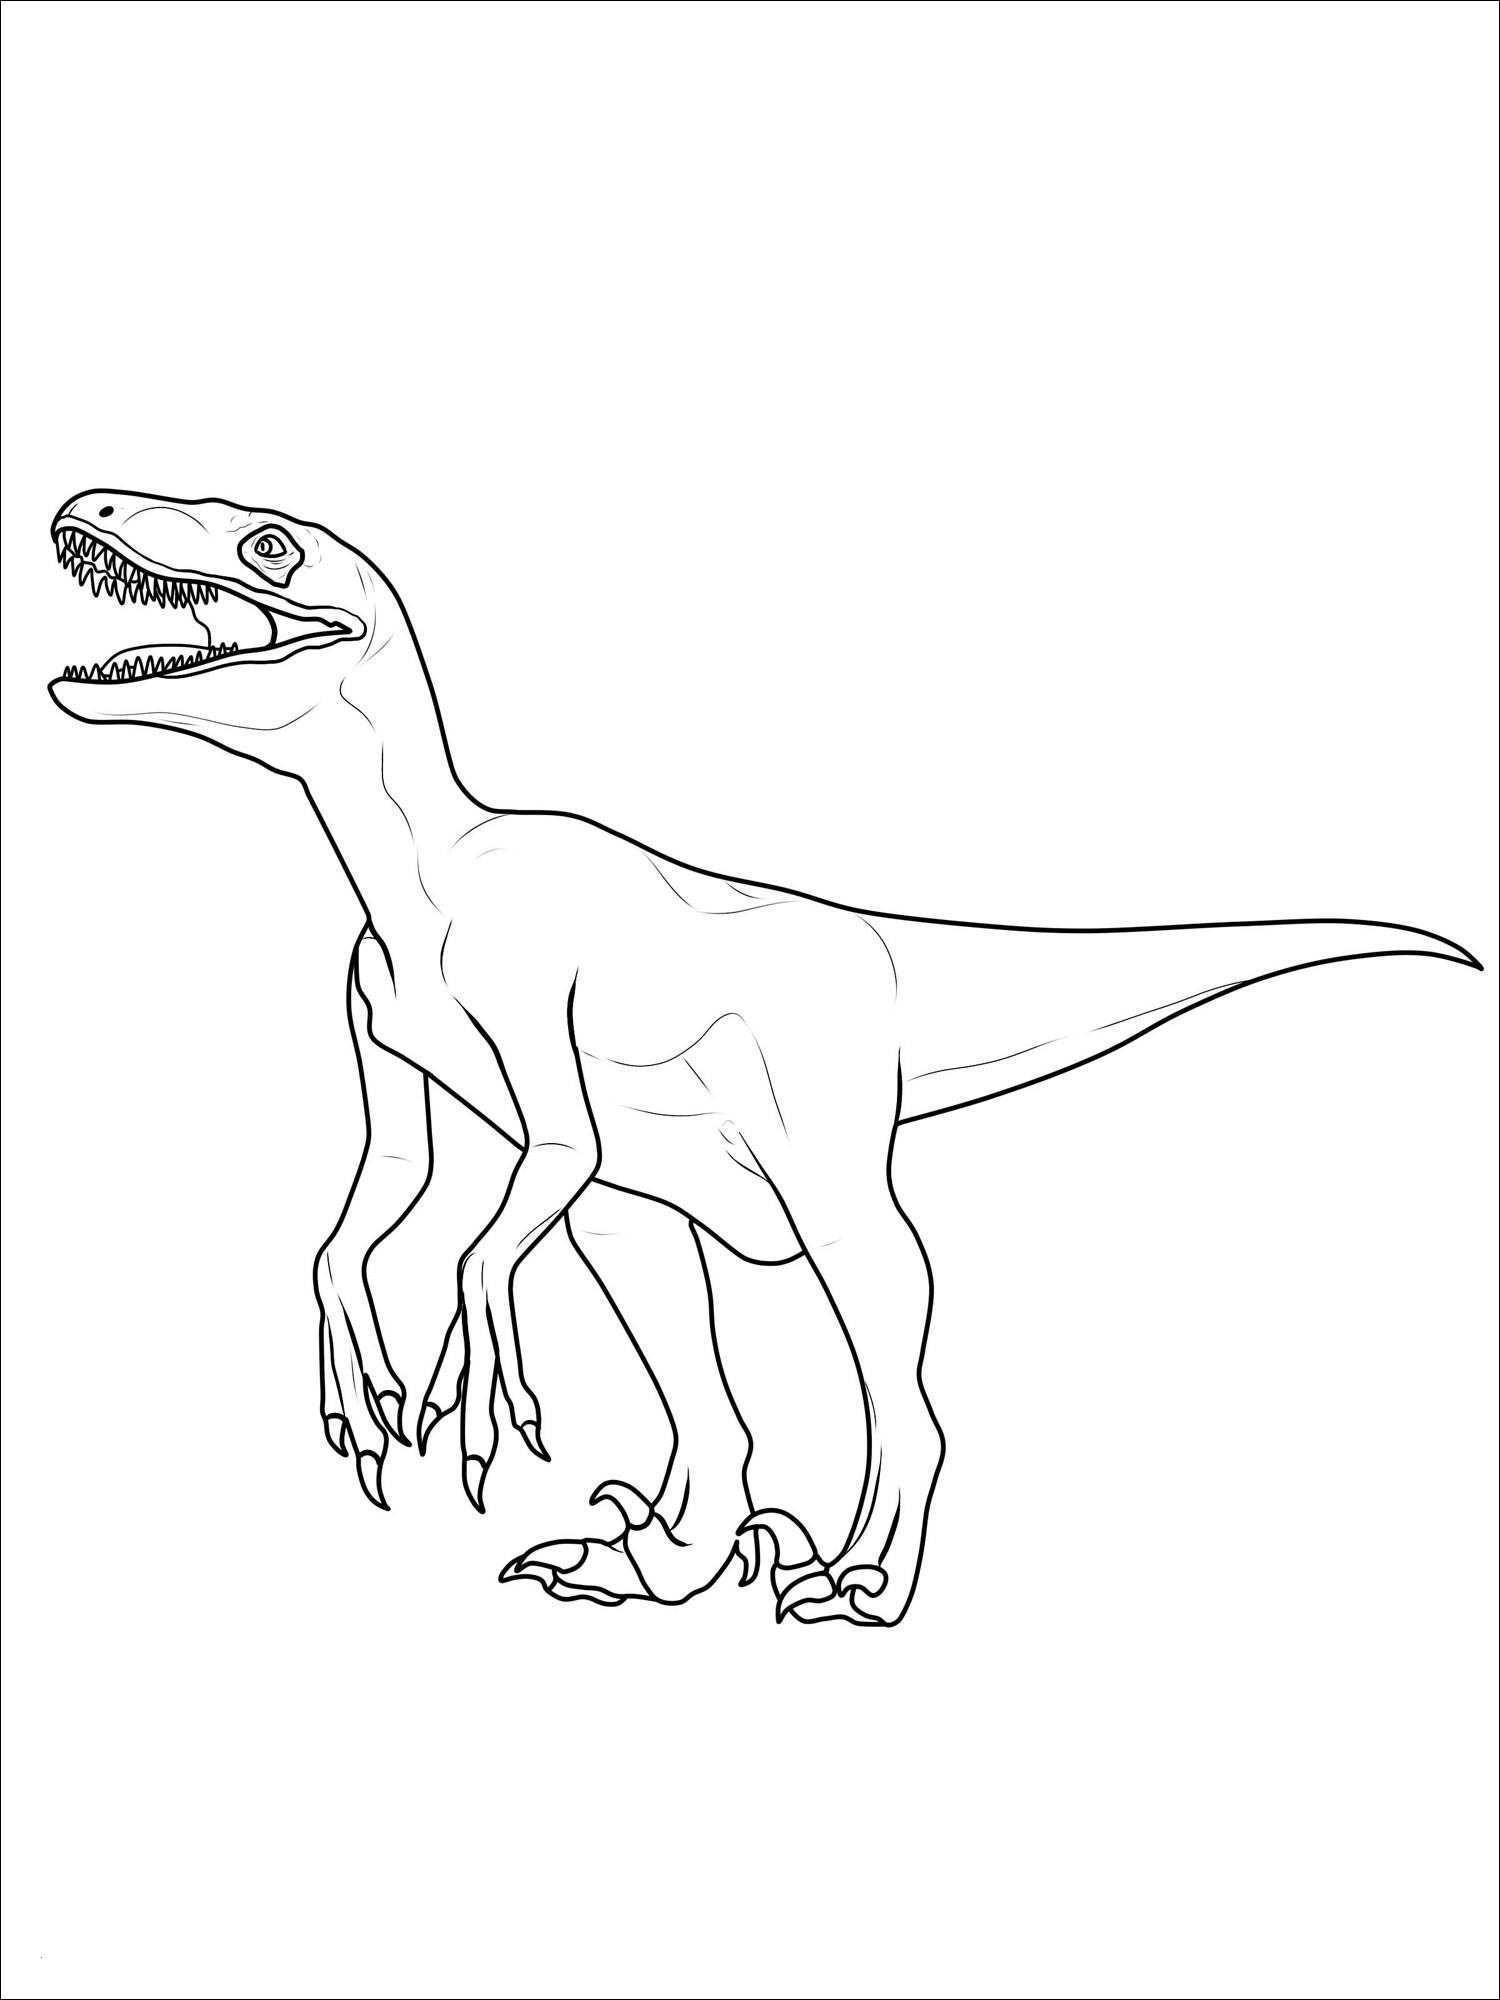 Tyrannosaurus Rex Ausmalbild Inspirierend Ausmalbilder T Rex 35 Ausmalbilder Zu Ostern Scoredatscore Fotografieren